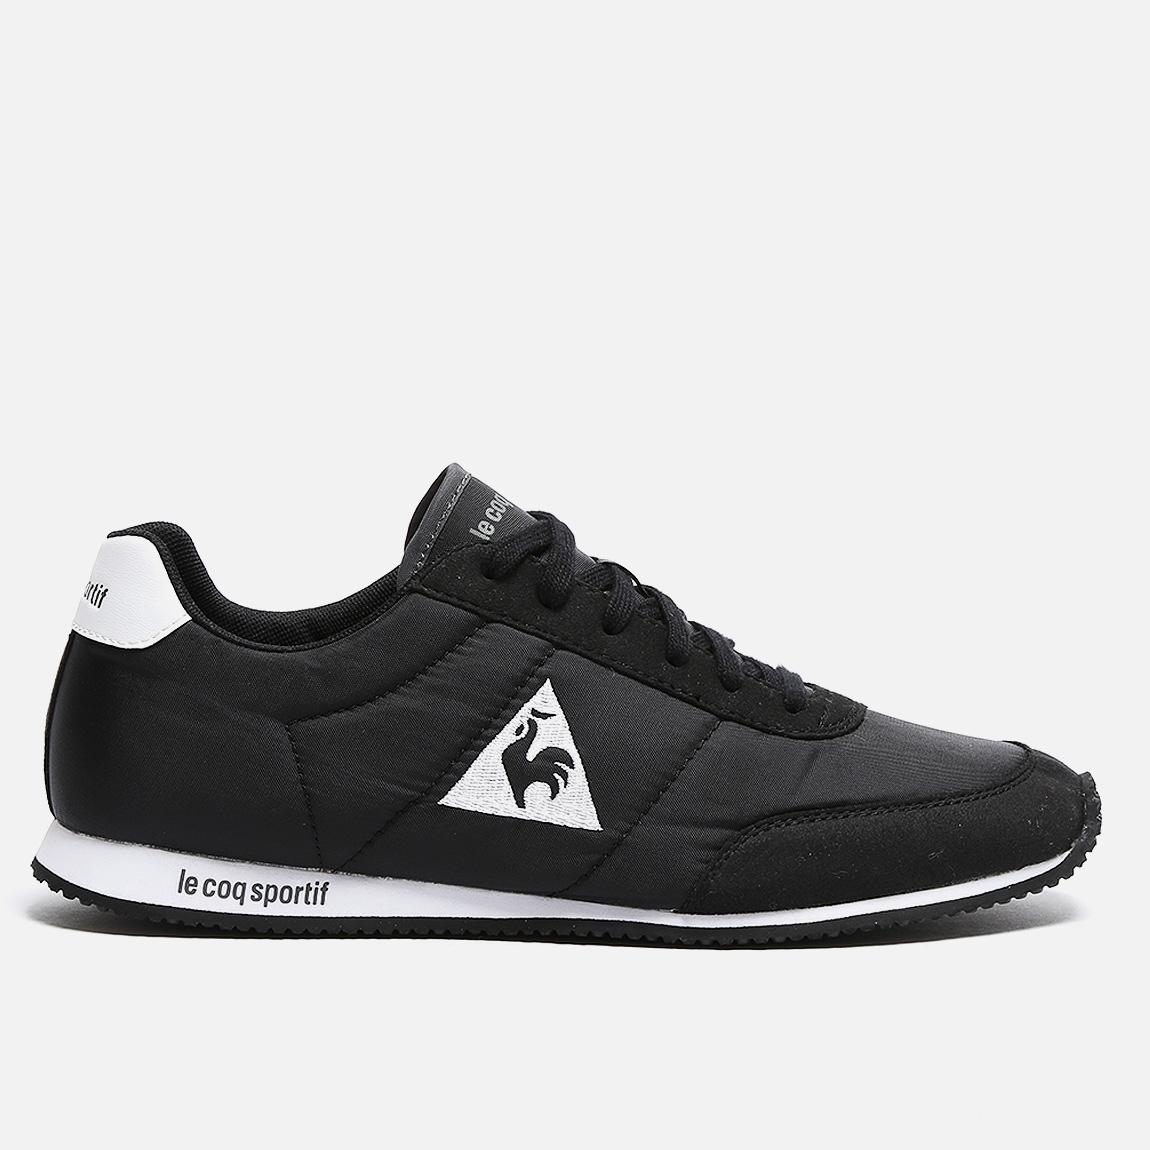 61425dc21ef3 Racerone Classic - Black Le Coq Sportif Sneakers